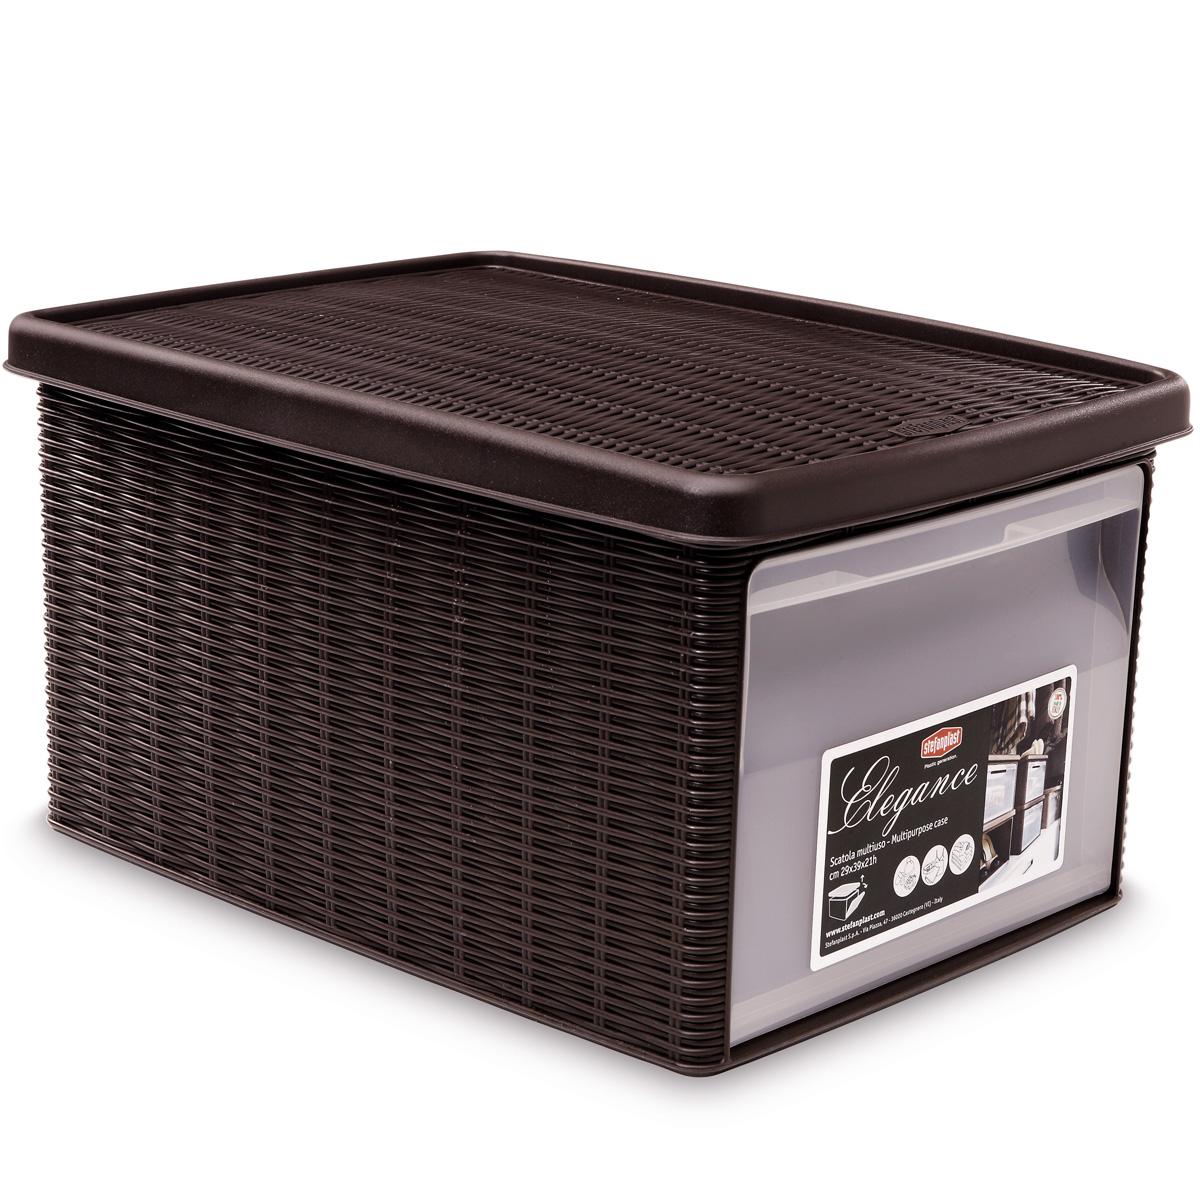 aufbewahrungsbox organiser kunststoff schuhbox stapelbox rattan box stapelbar ebay. Black Bedroom Furniture Sets. Home Design Ideas